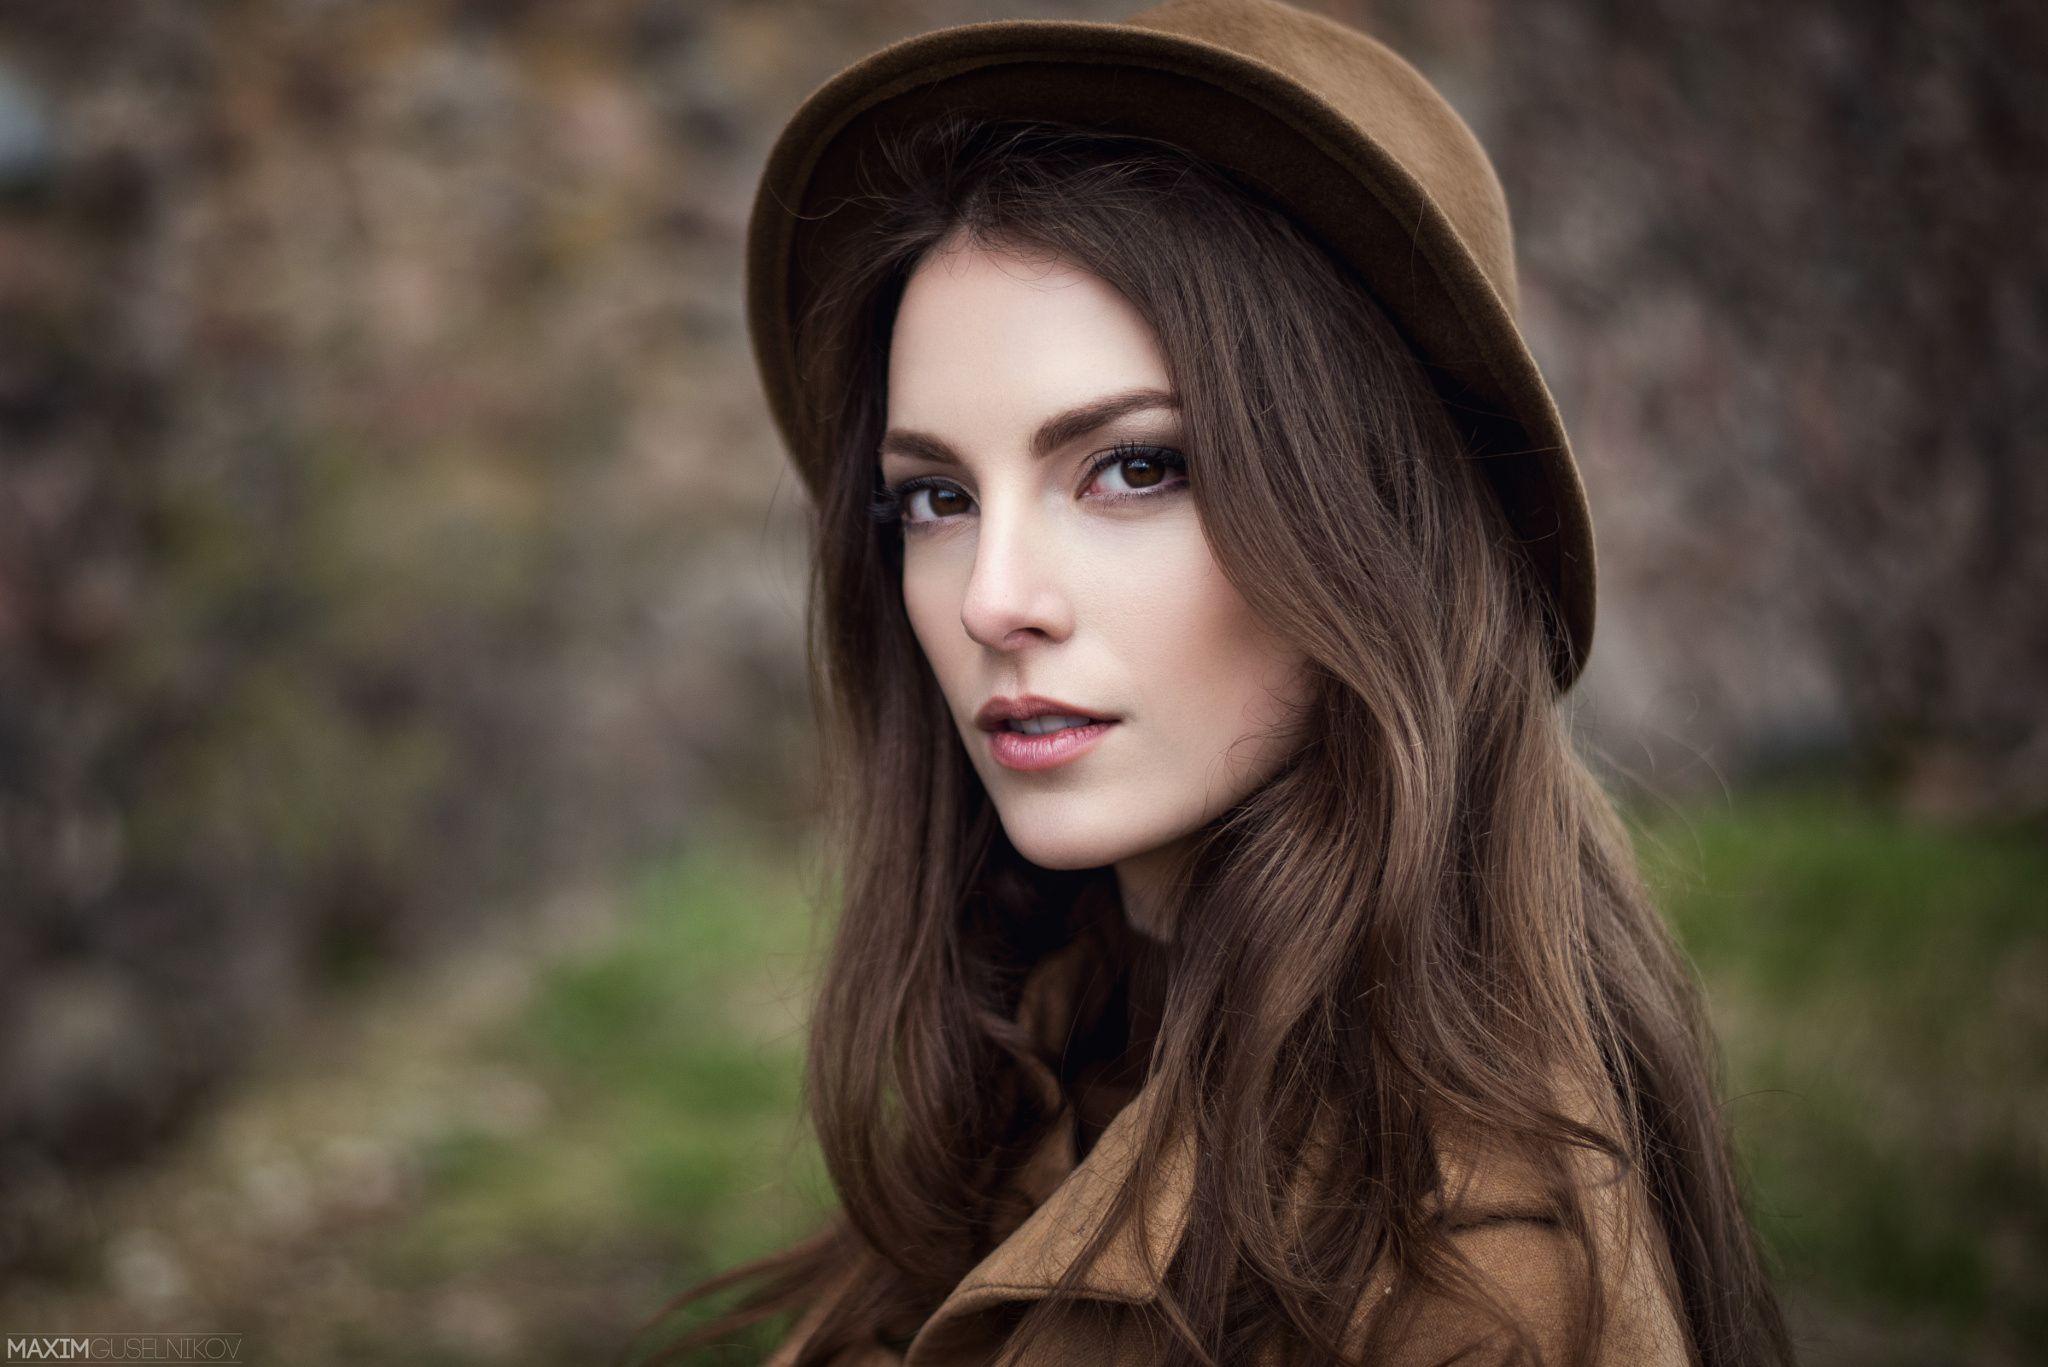 natural beauty girl wallpapers: Karina By Maxim Guselnikov On 500px. Russian Girl